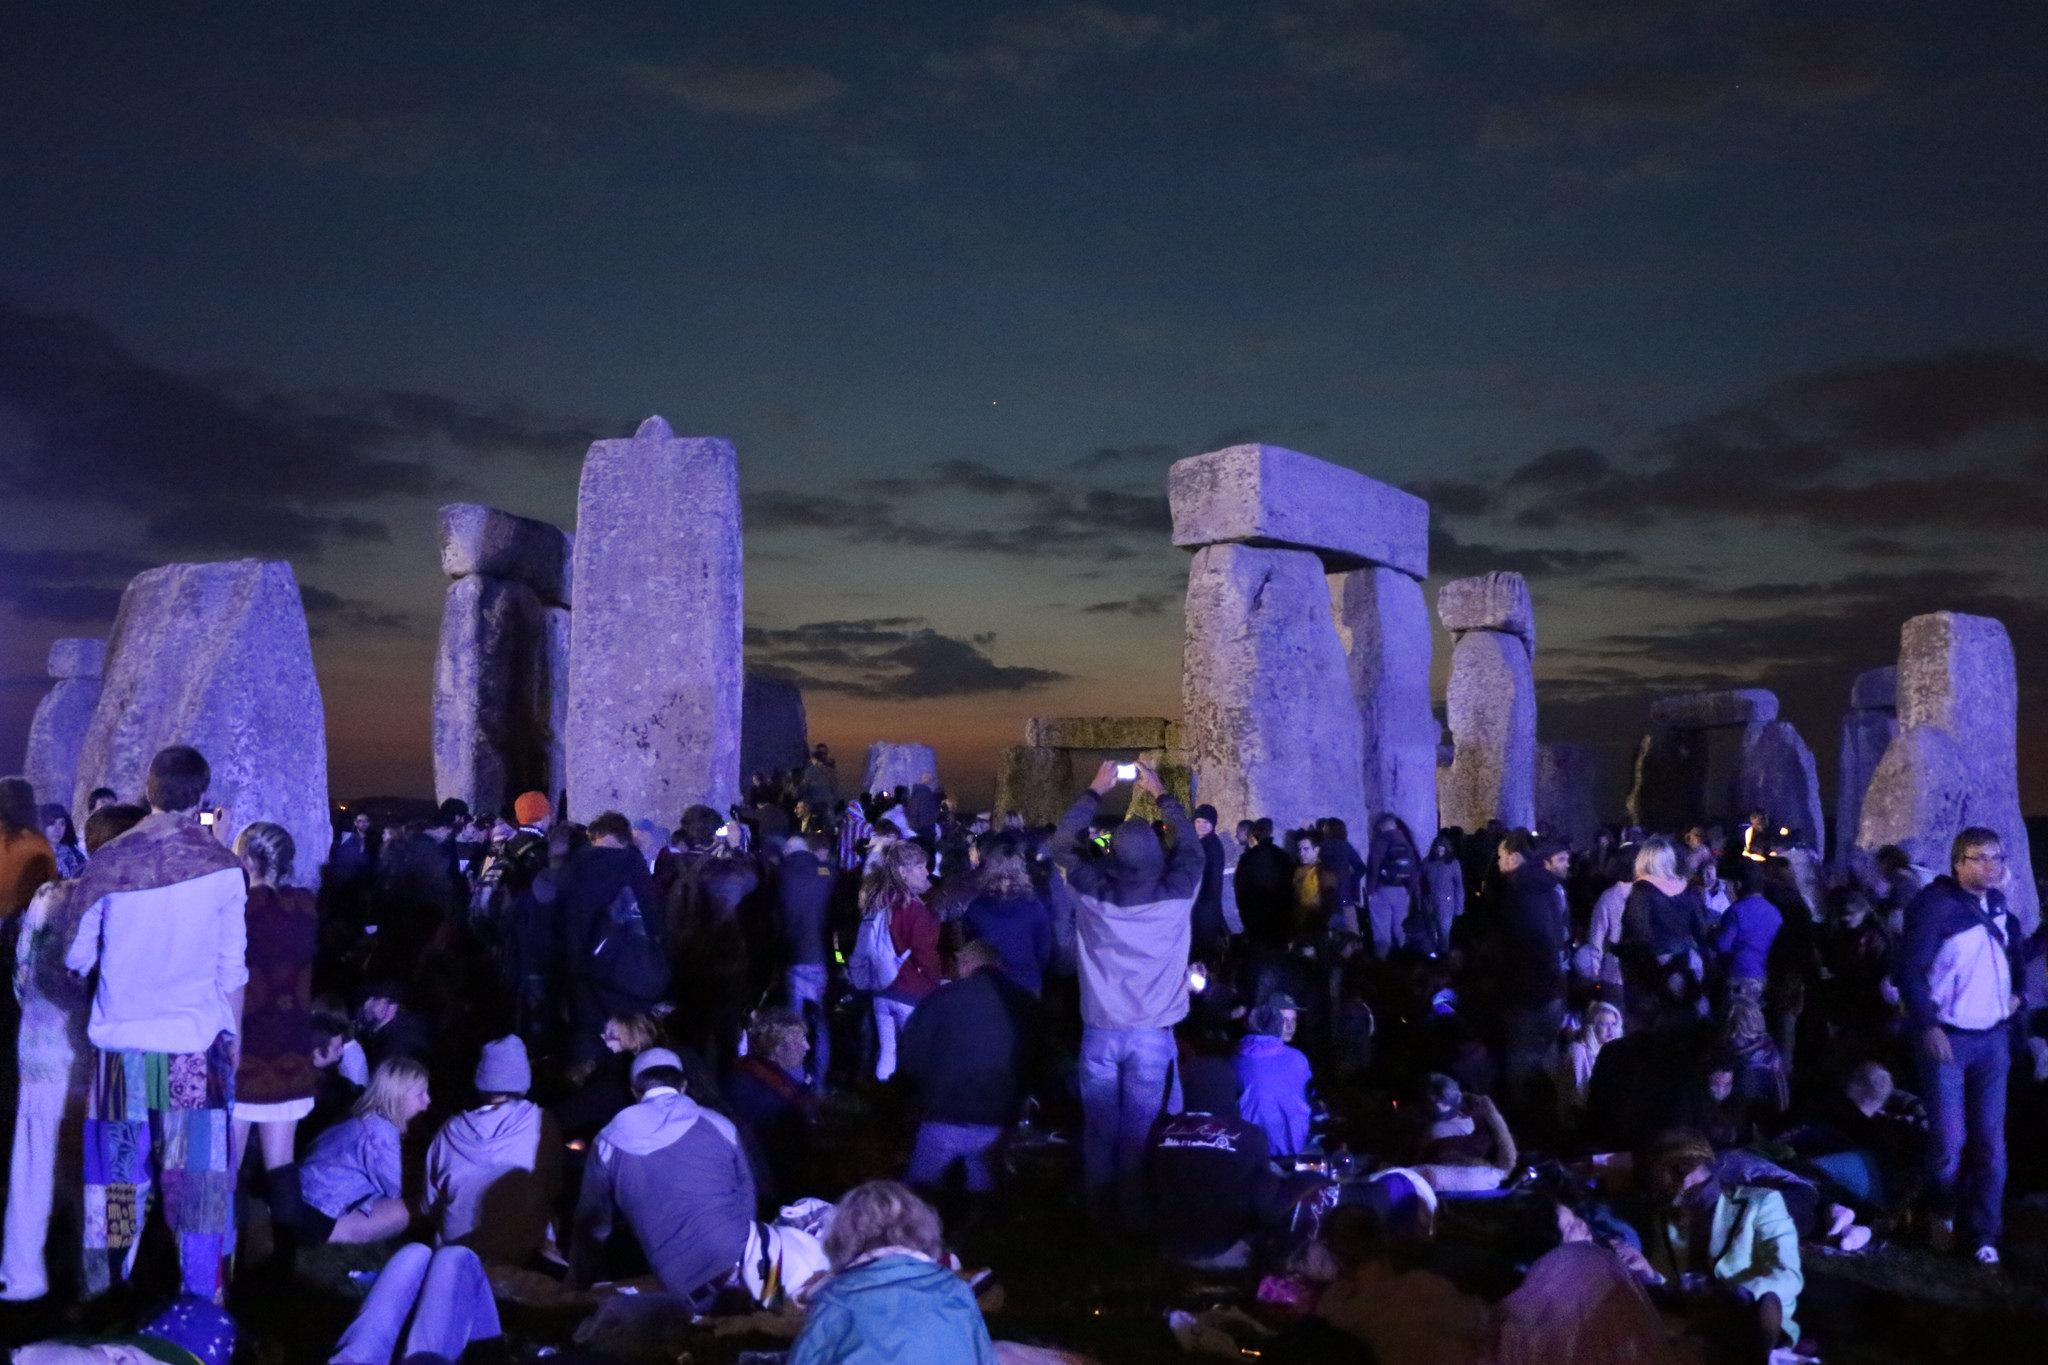 People celebrating the summer solstice at Stonehenge. Image credit:  Chris Stevenson / Creative Commons